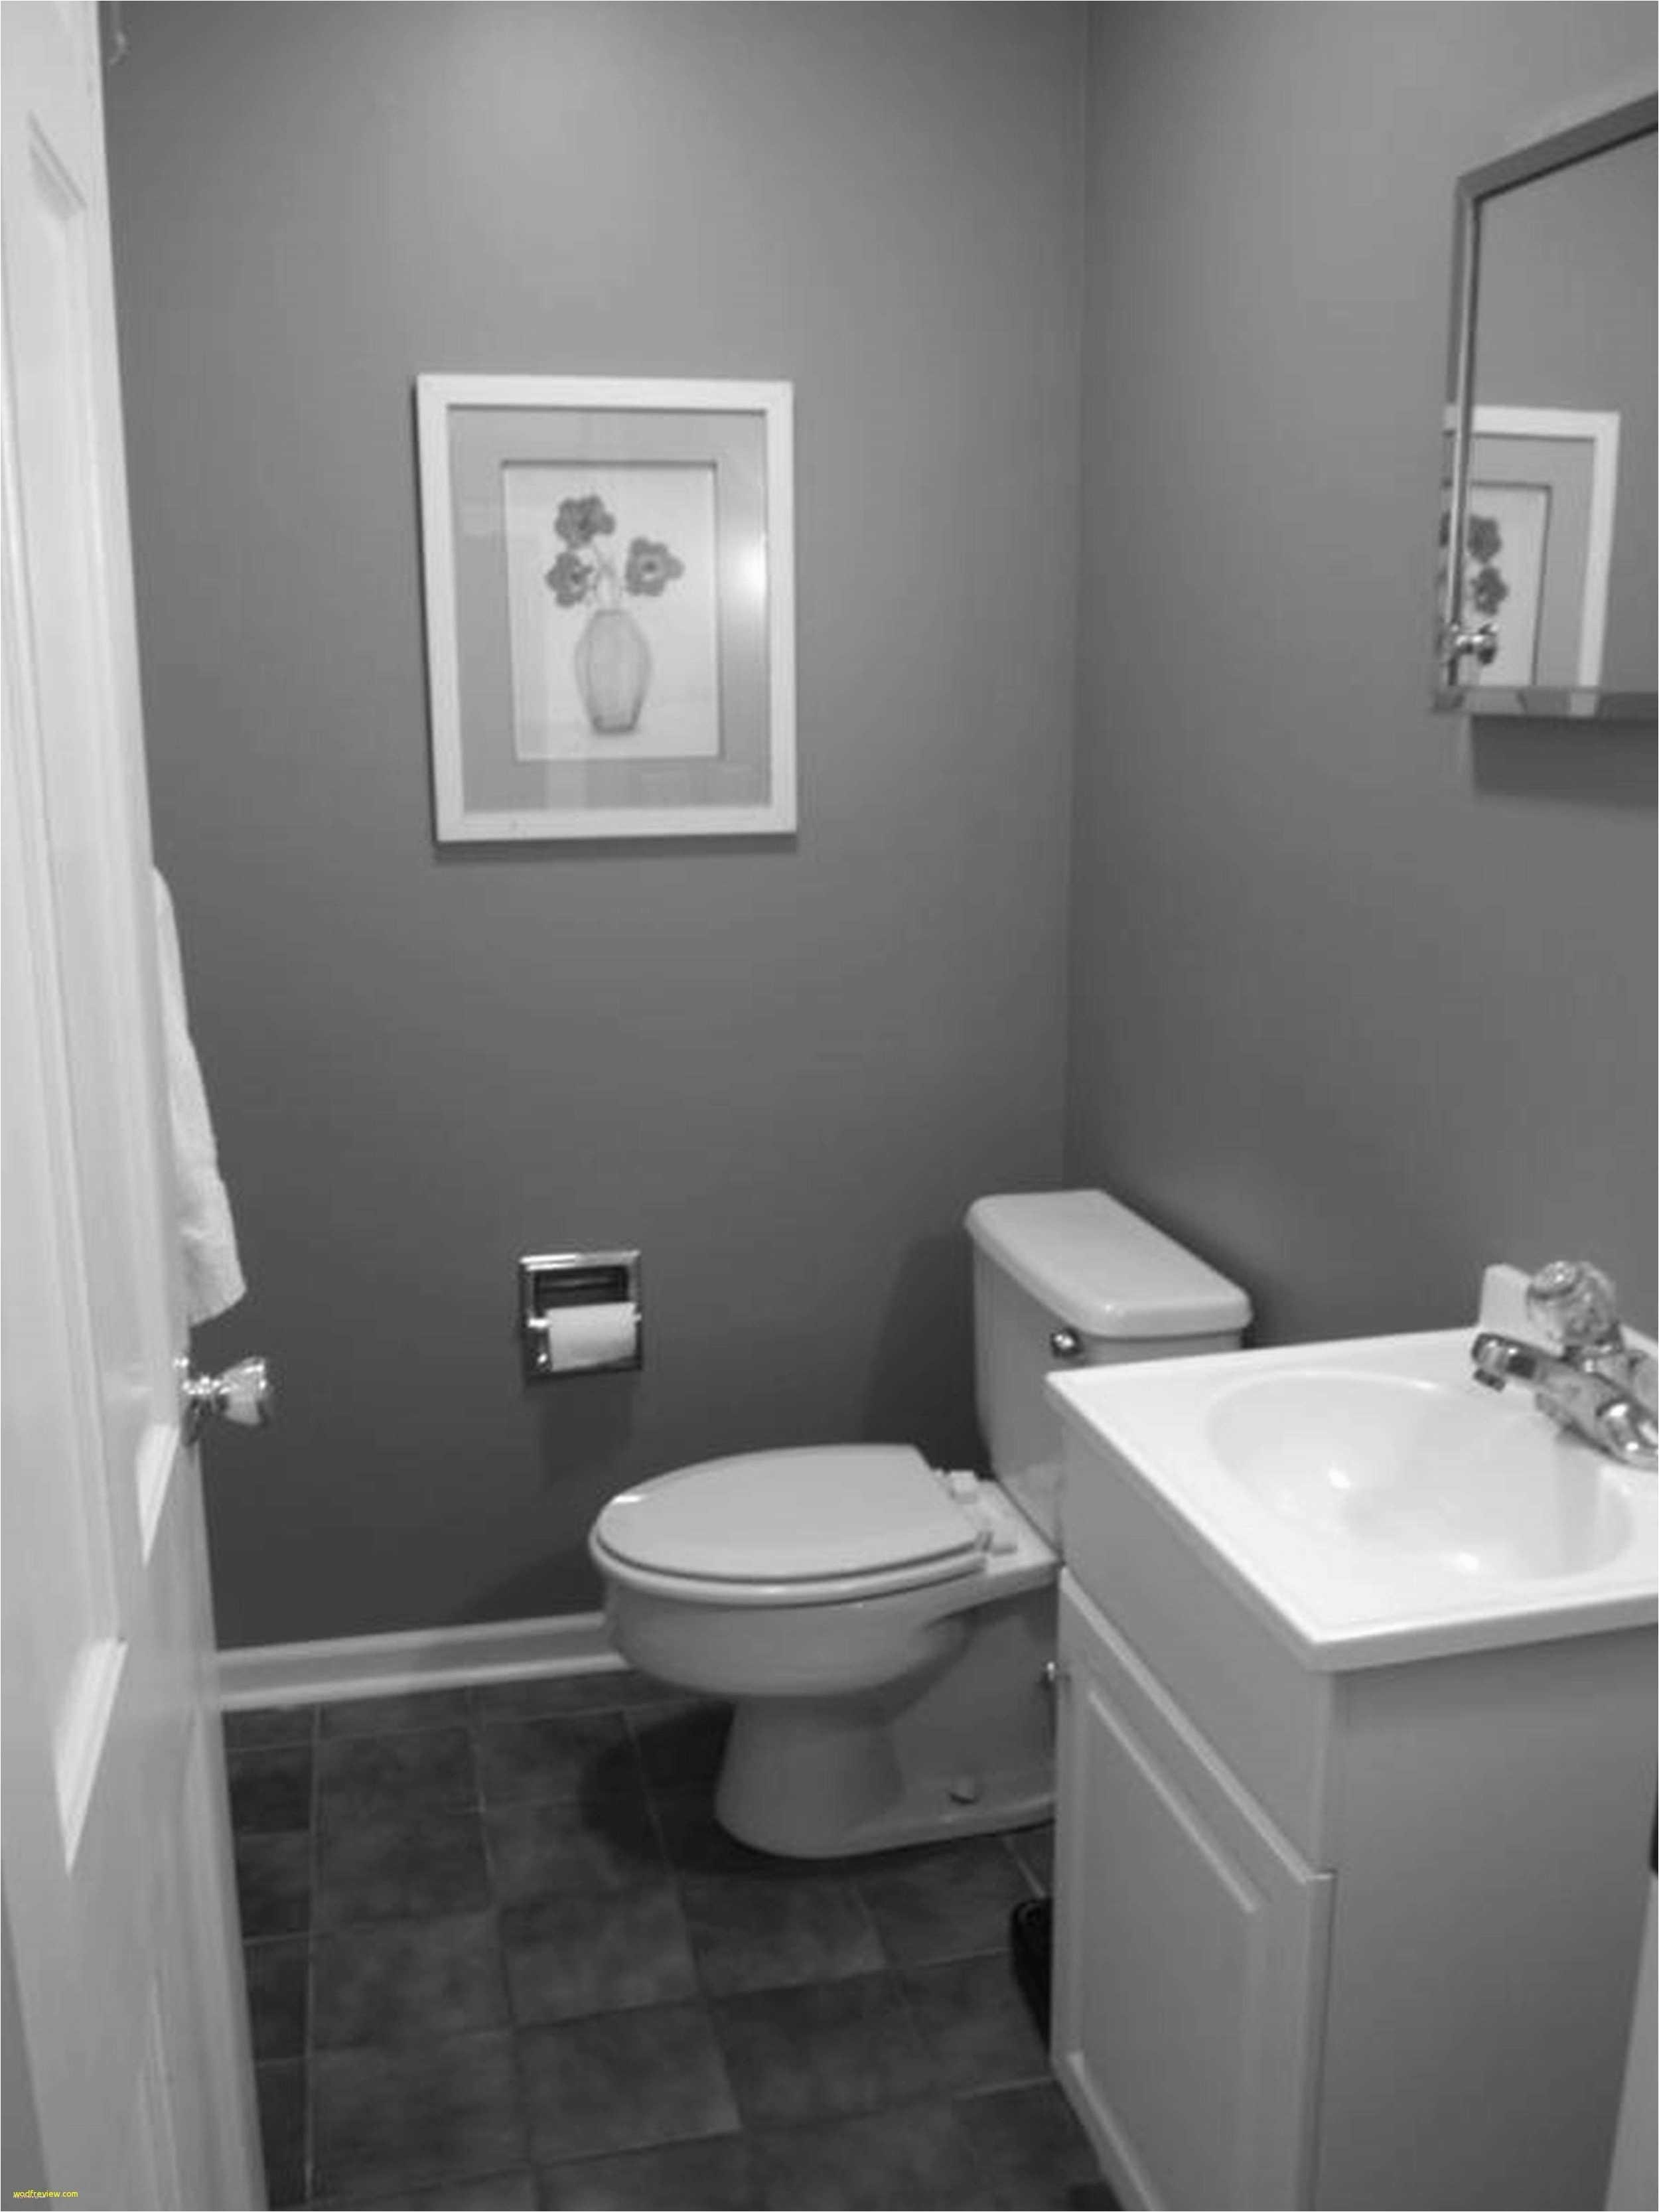 Master Bathroom Design New Master Bathroom Save White Bathroom Designs Fresh Grey Bathroom 0d